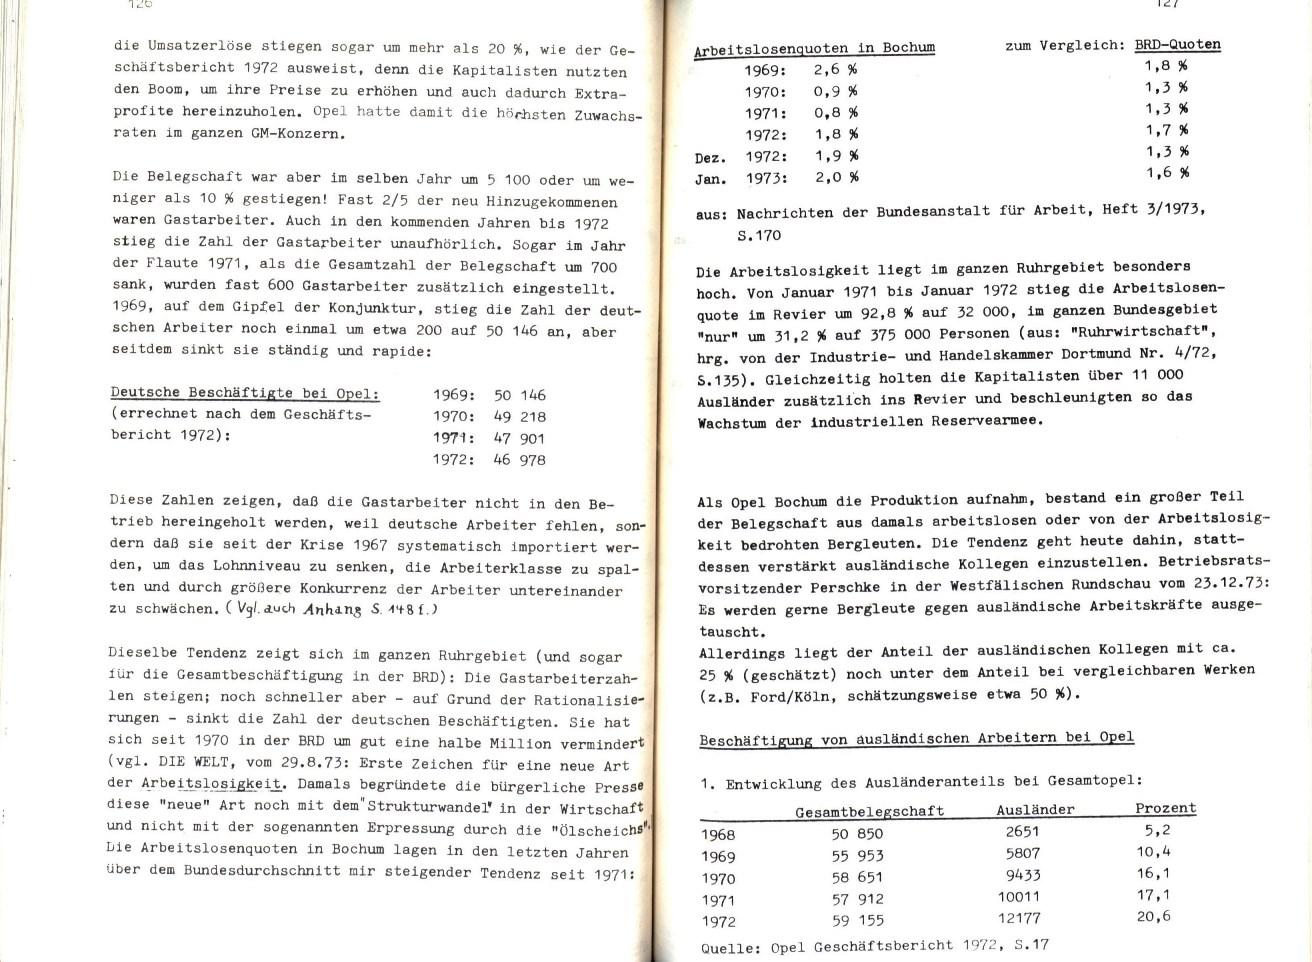 Bochum_IGM_Opel_PG_Opel_streikt_1973_065